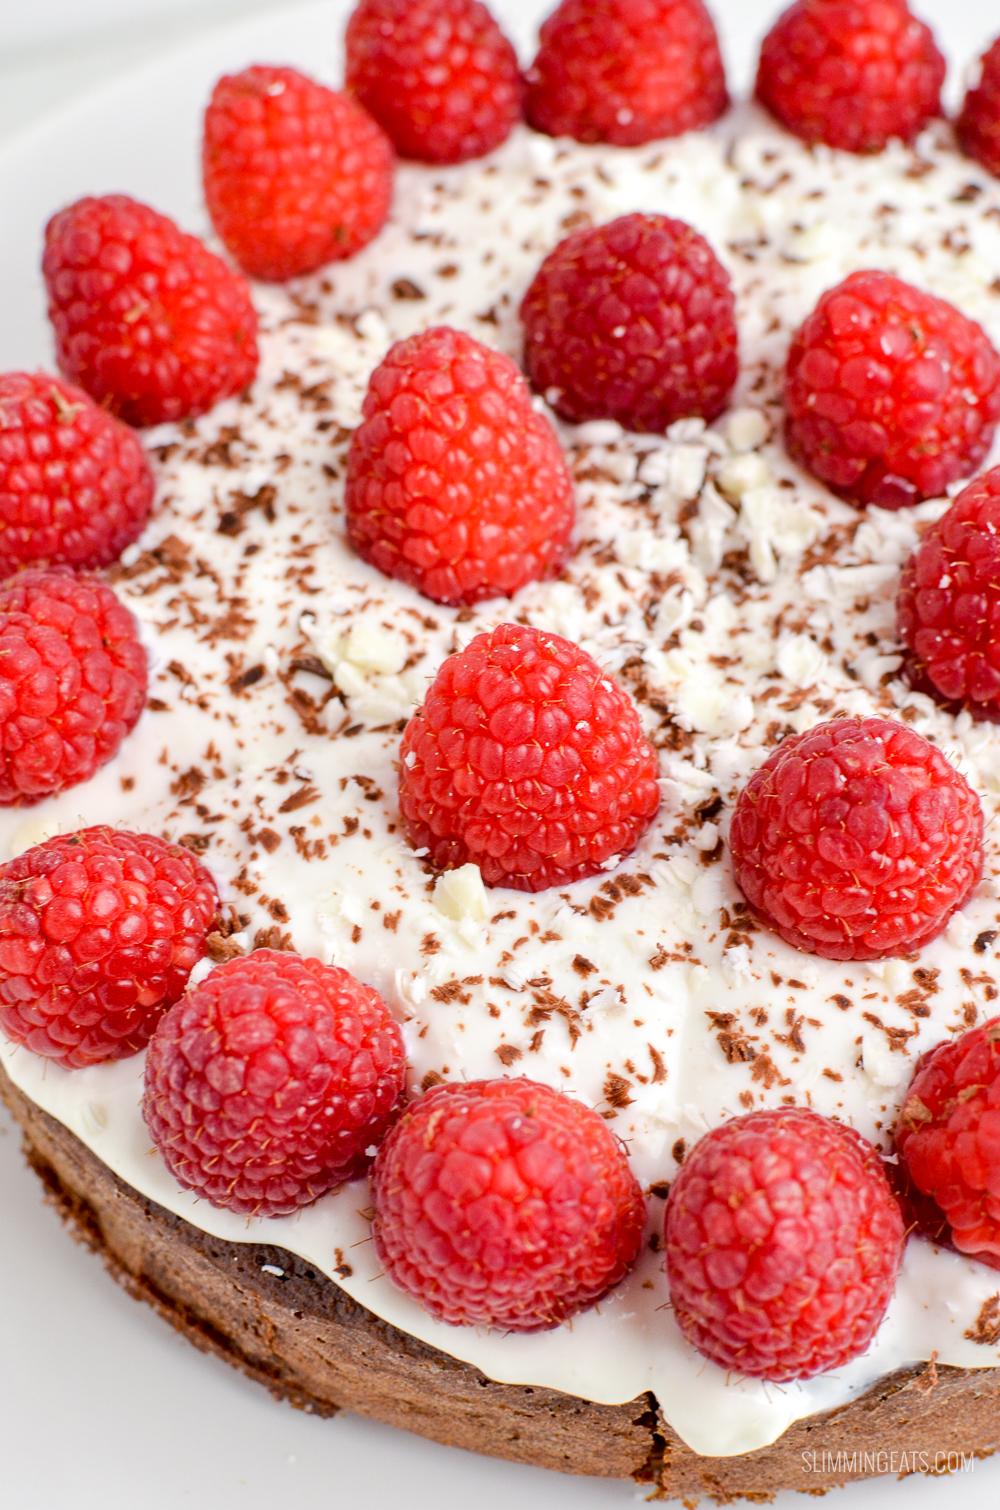 close up of raspberries on chocolate scan bran cake